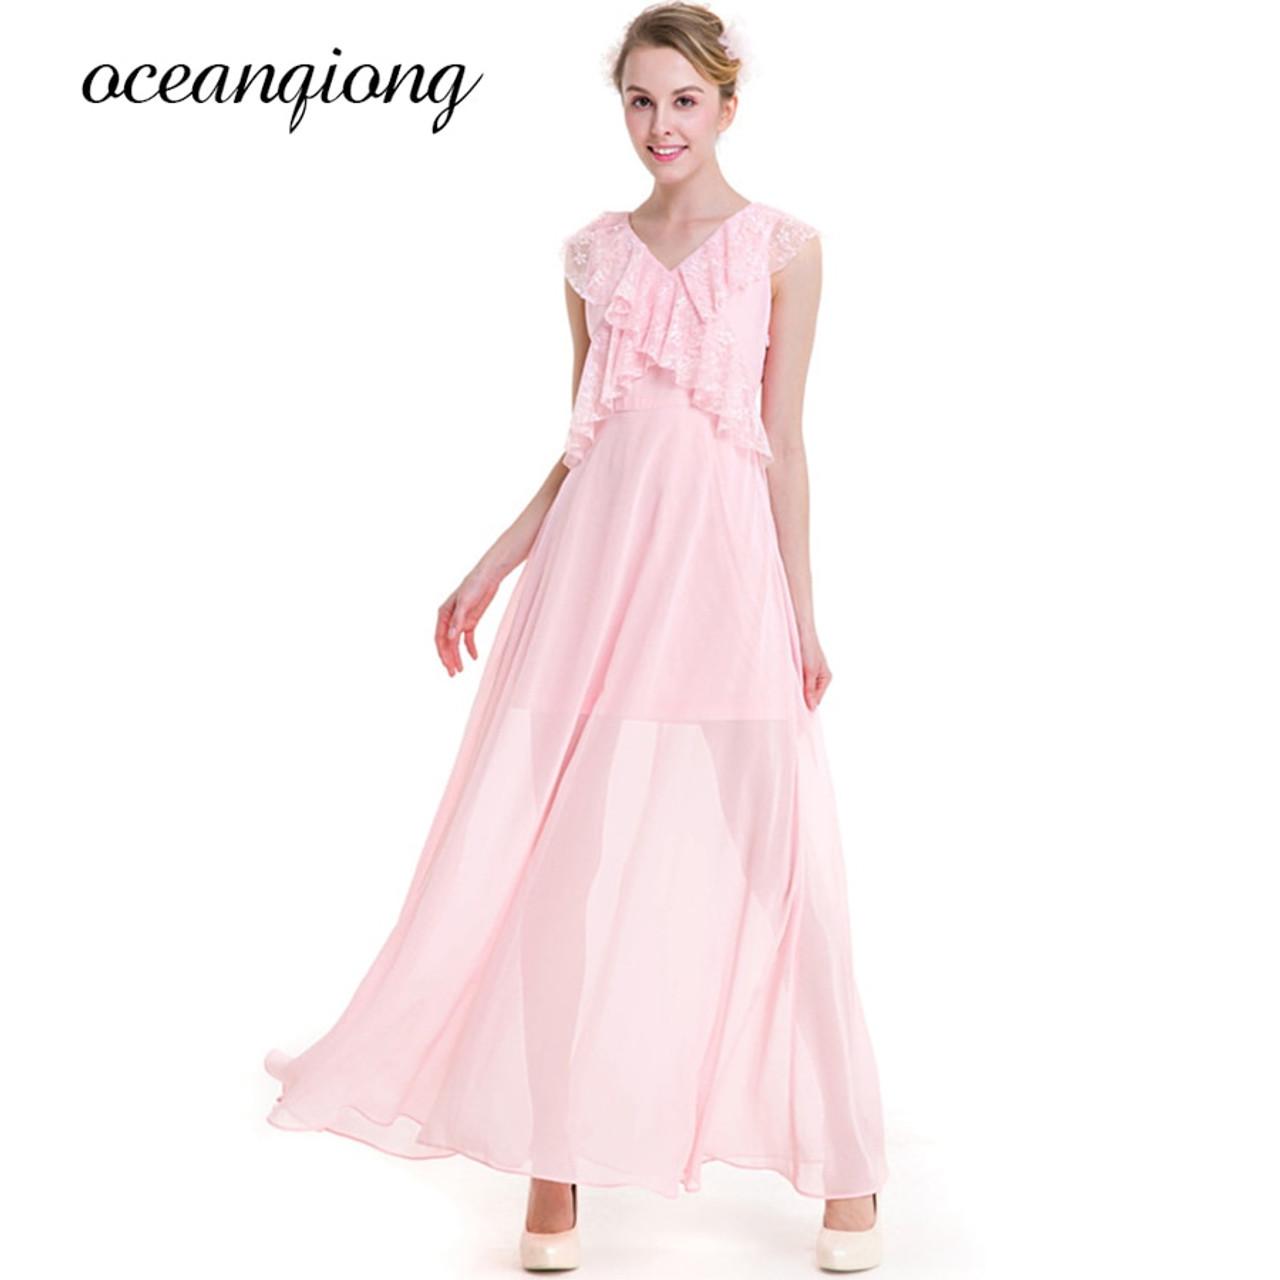 Floral Women Dress Lace Fashion V Neck Long Maxi Dress Sexy Ruffles  Sleeveless Causal Plus Size Chiffon Party Dresses Vestidos - OnshopDeals.Com e190fbf7d